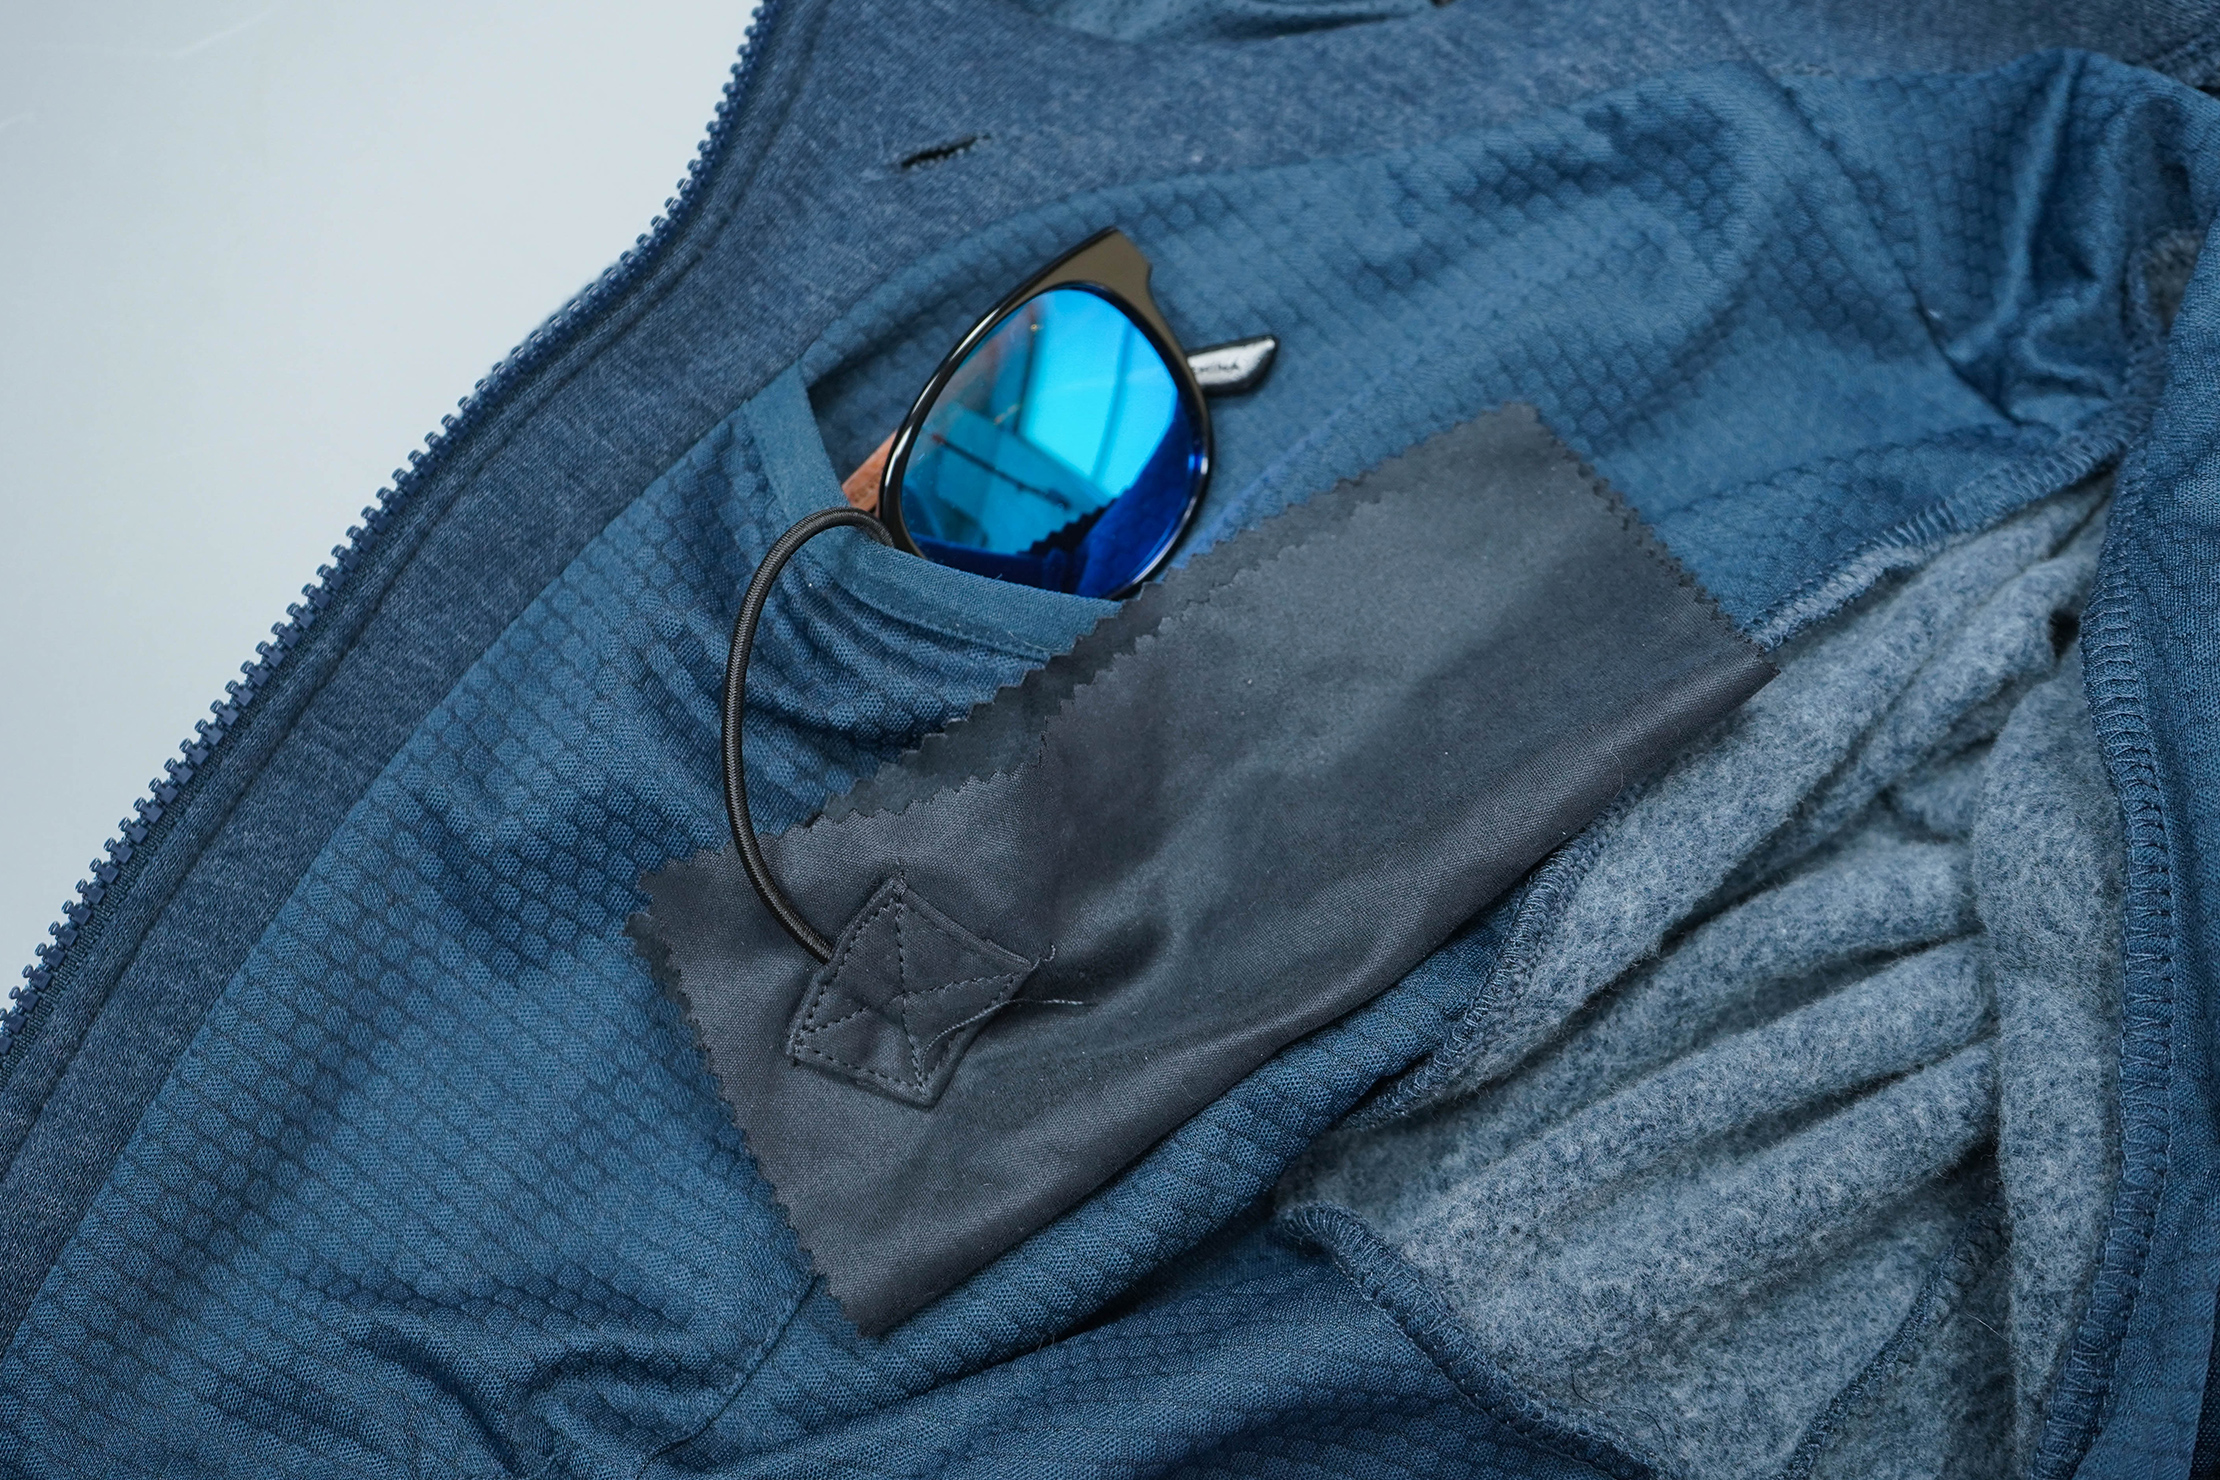 BauBax Sweatshirt 2.0 Sunglasses Pocket